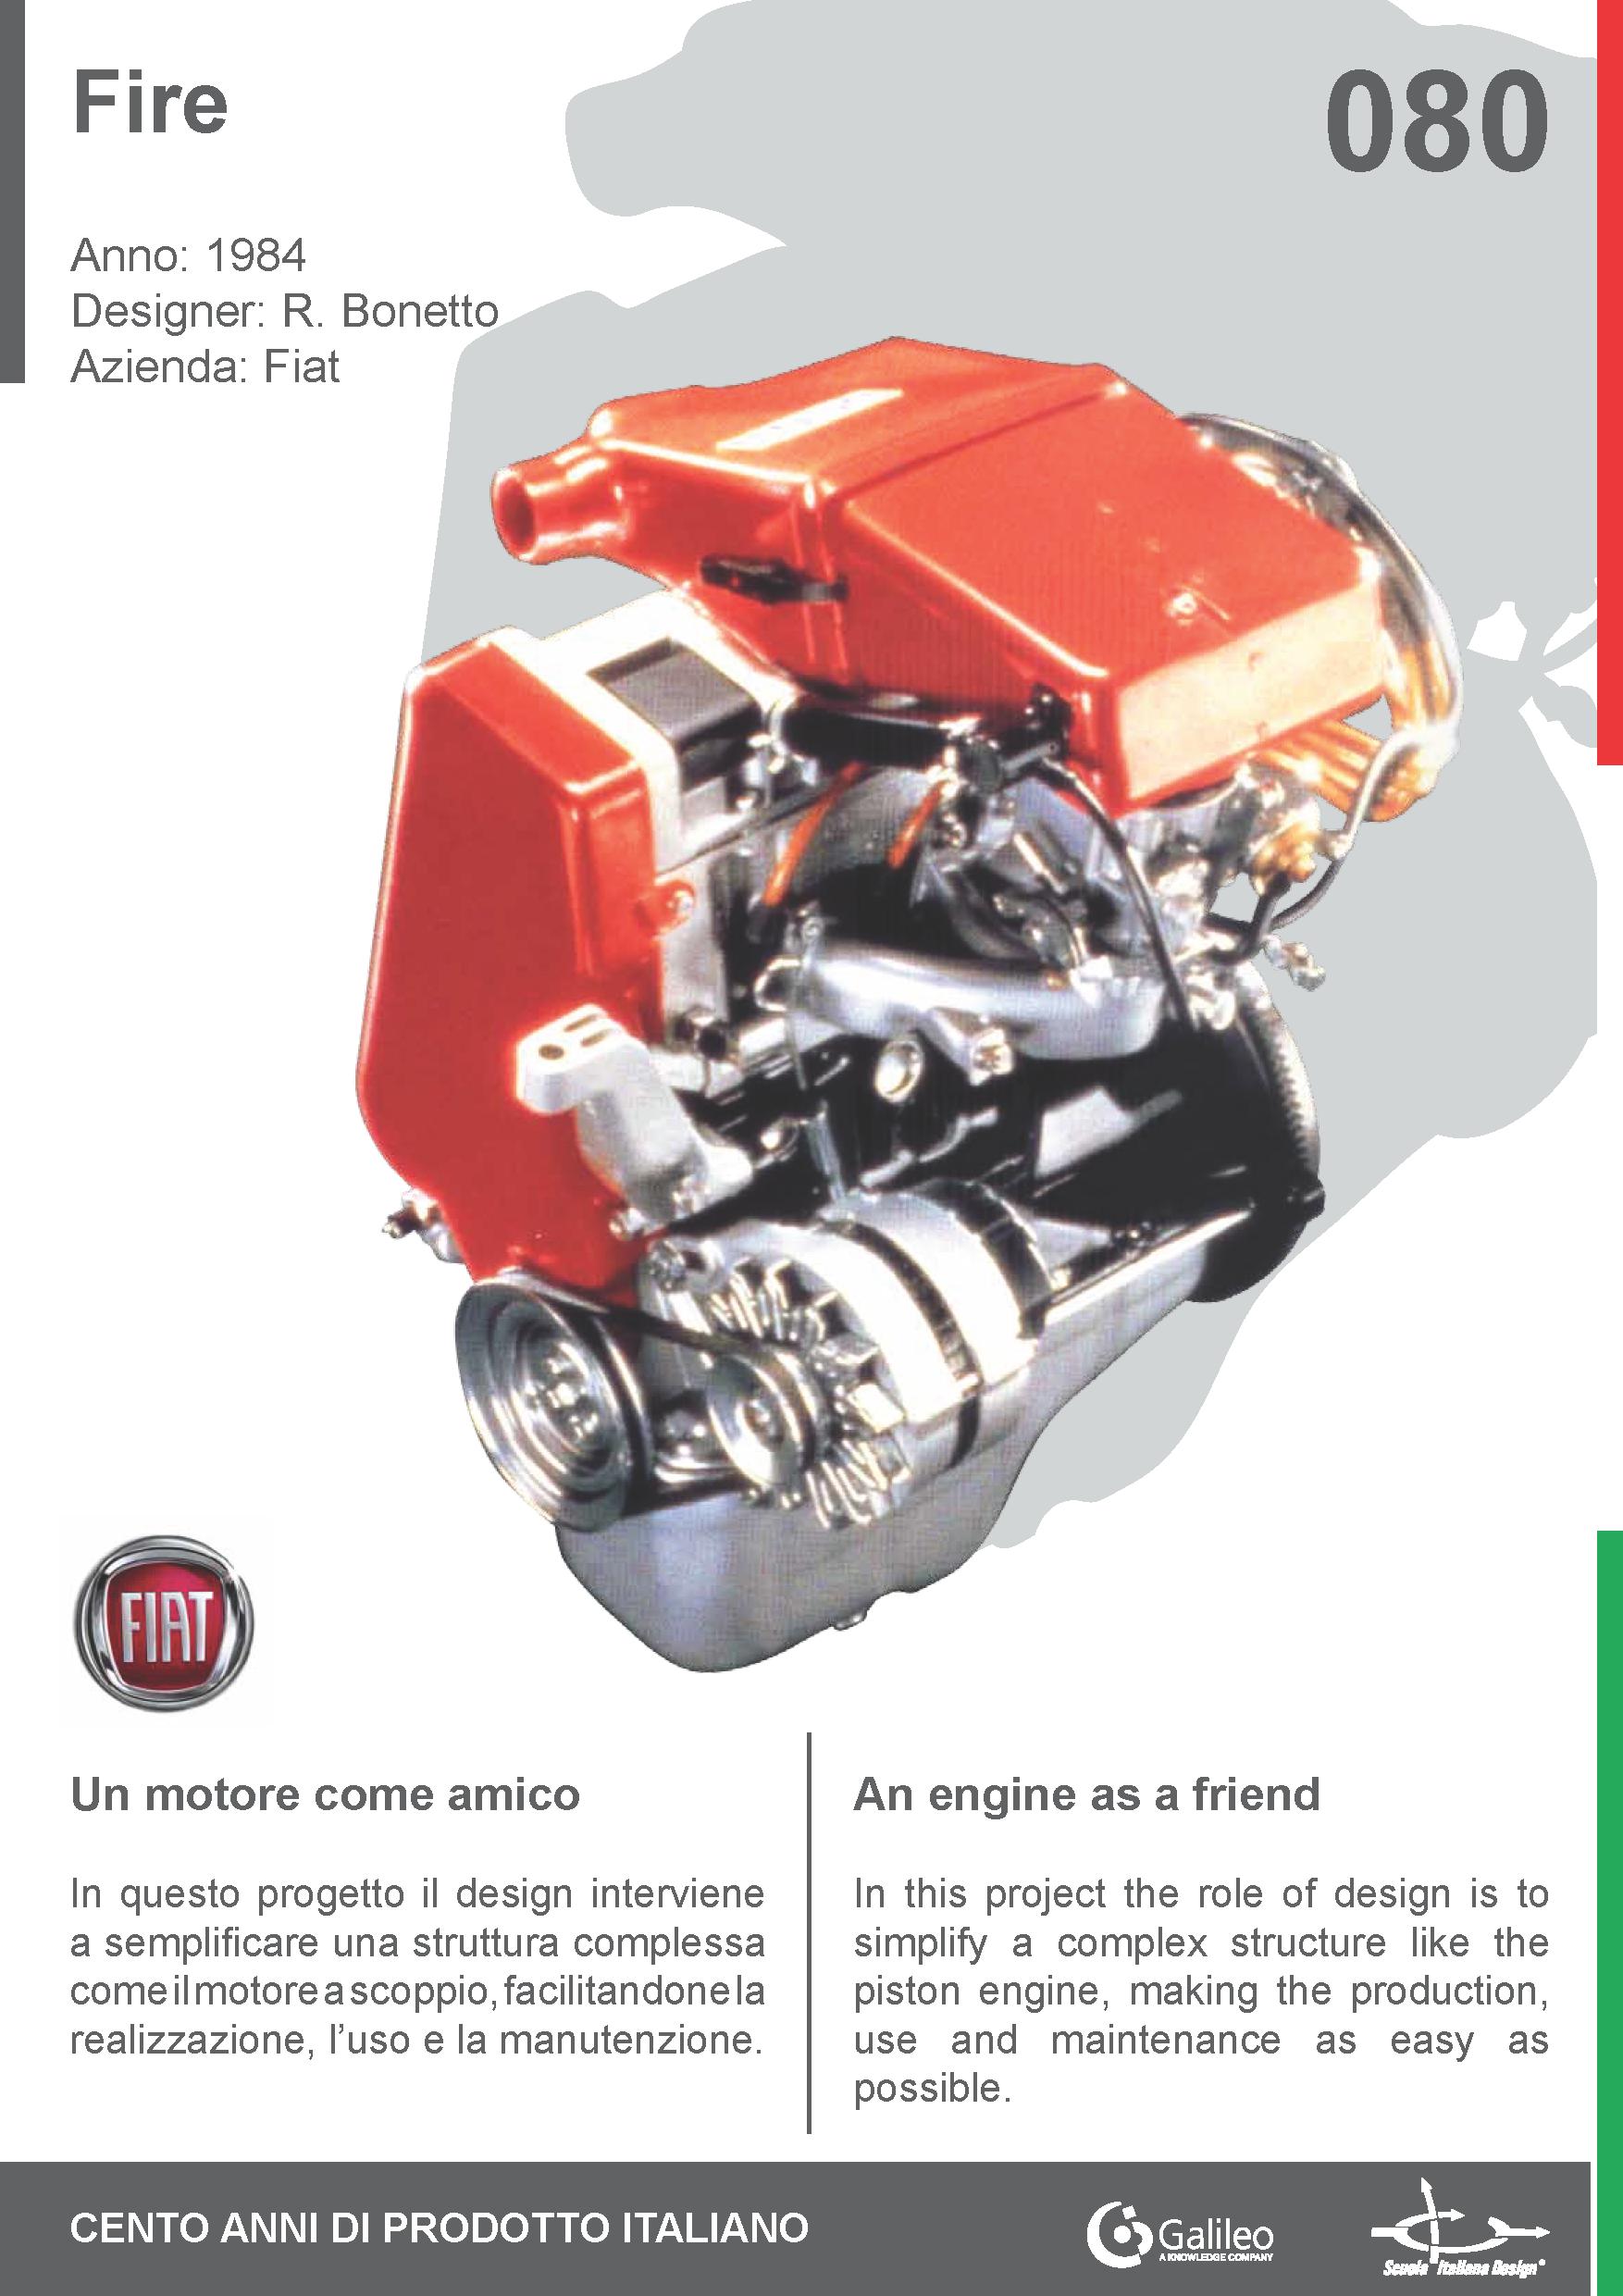 Fire by Rodolfo Bonetto for Fiat (1984) #engine #simplify #car | 100 ...